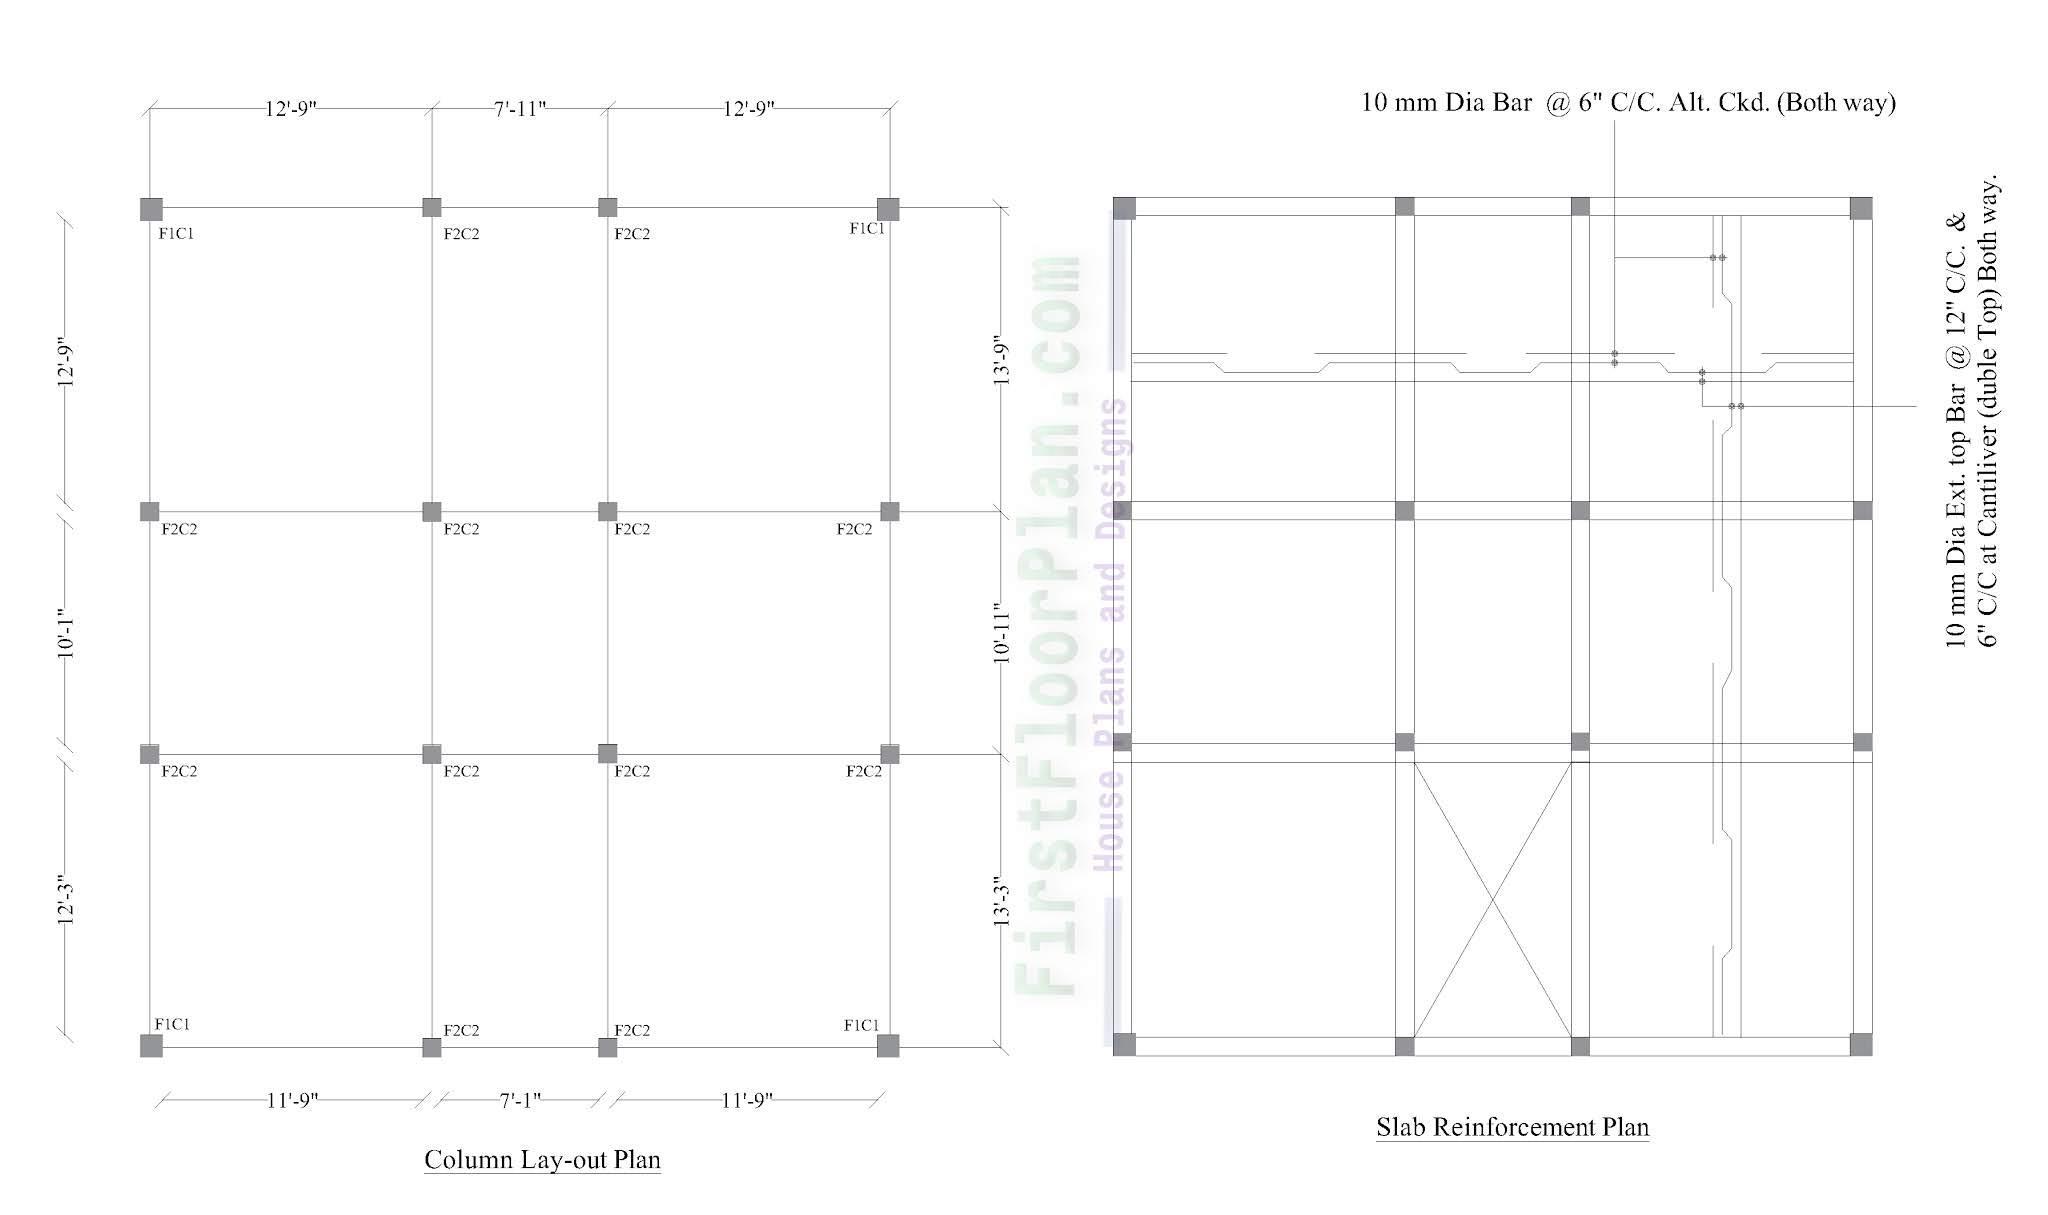 column layout and slab reinforcement details